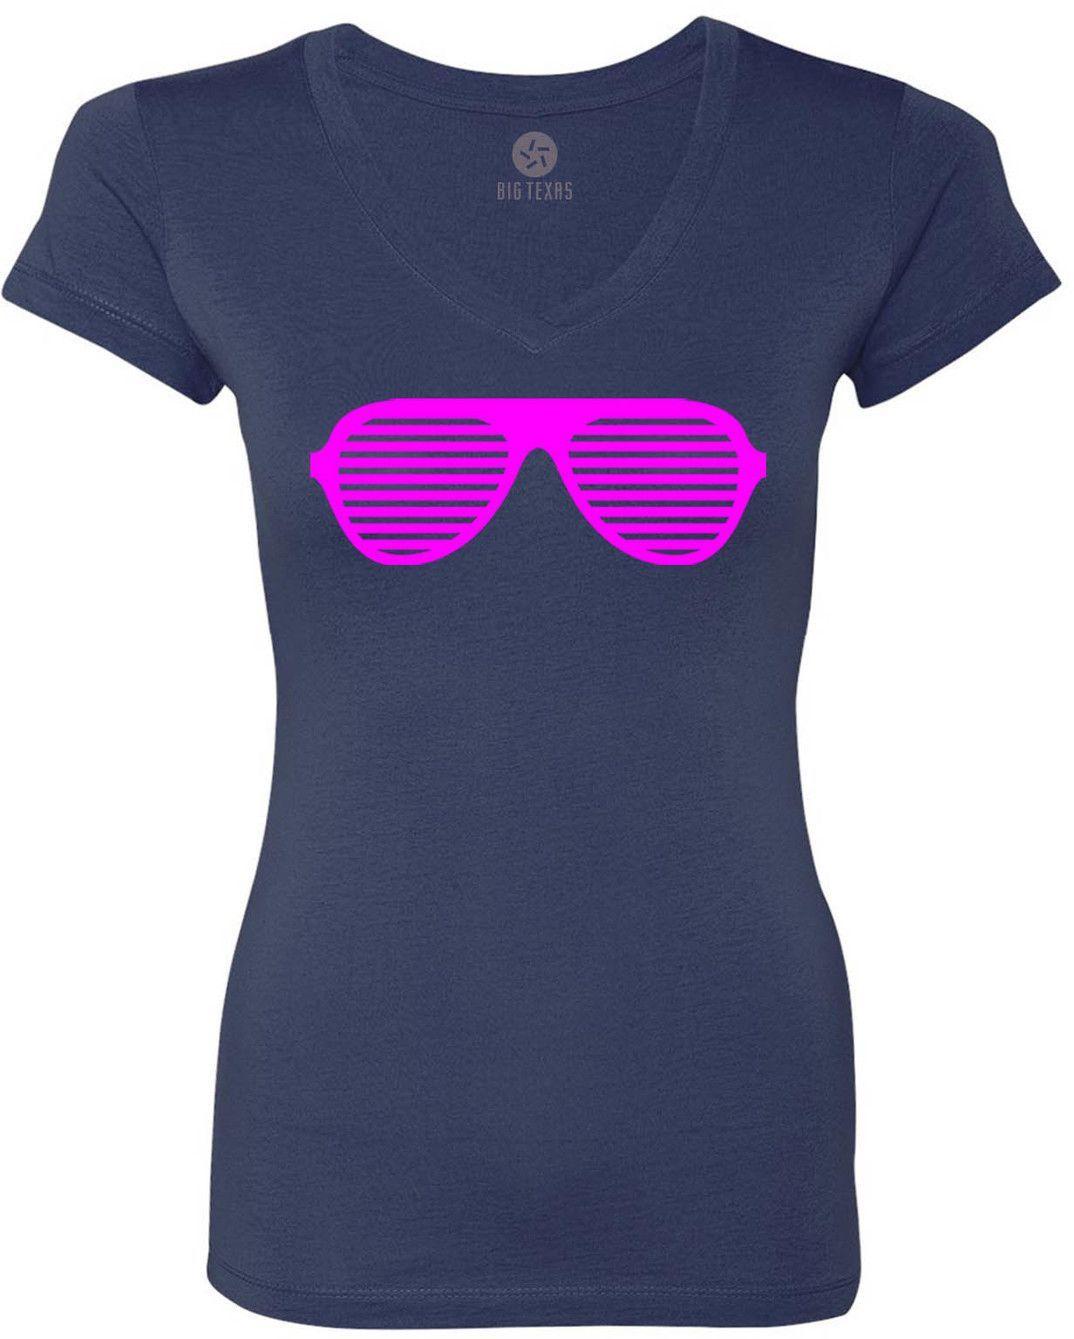 Raver Shades (Pink) Women's Short-Sleeve V-Neck T-Shirt